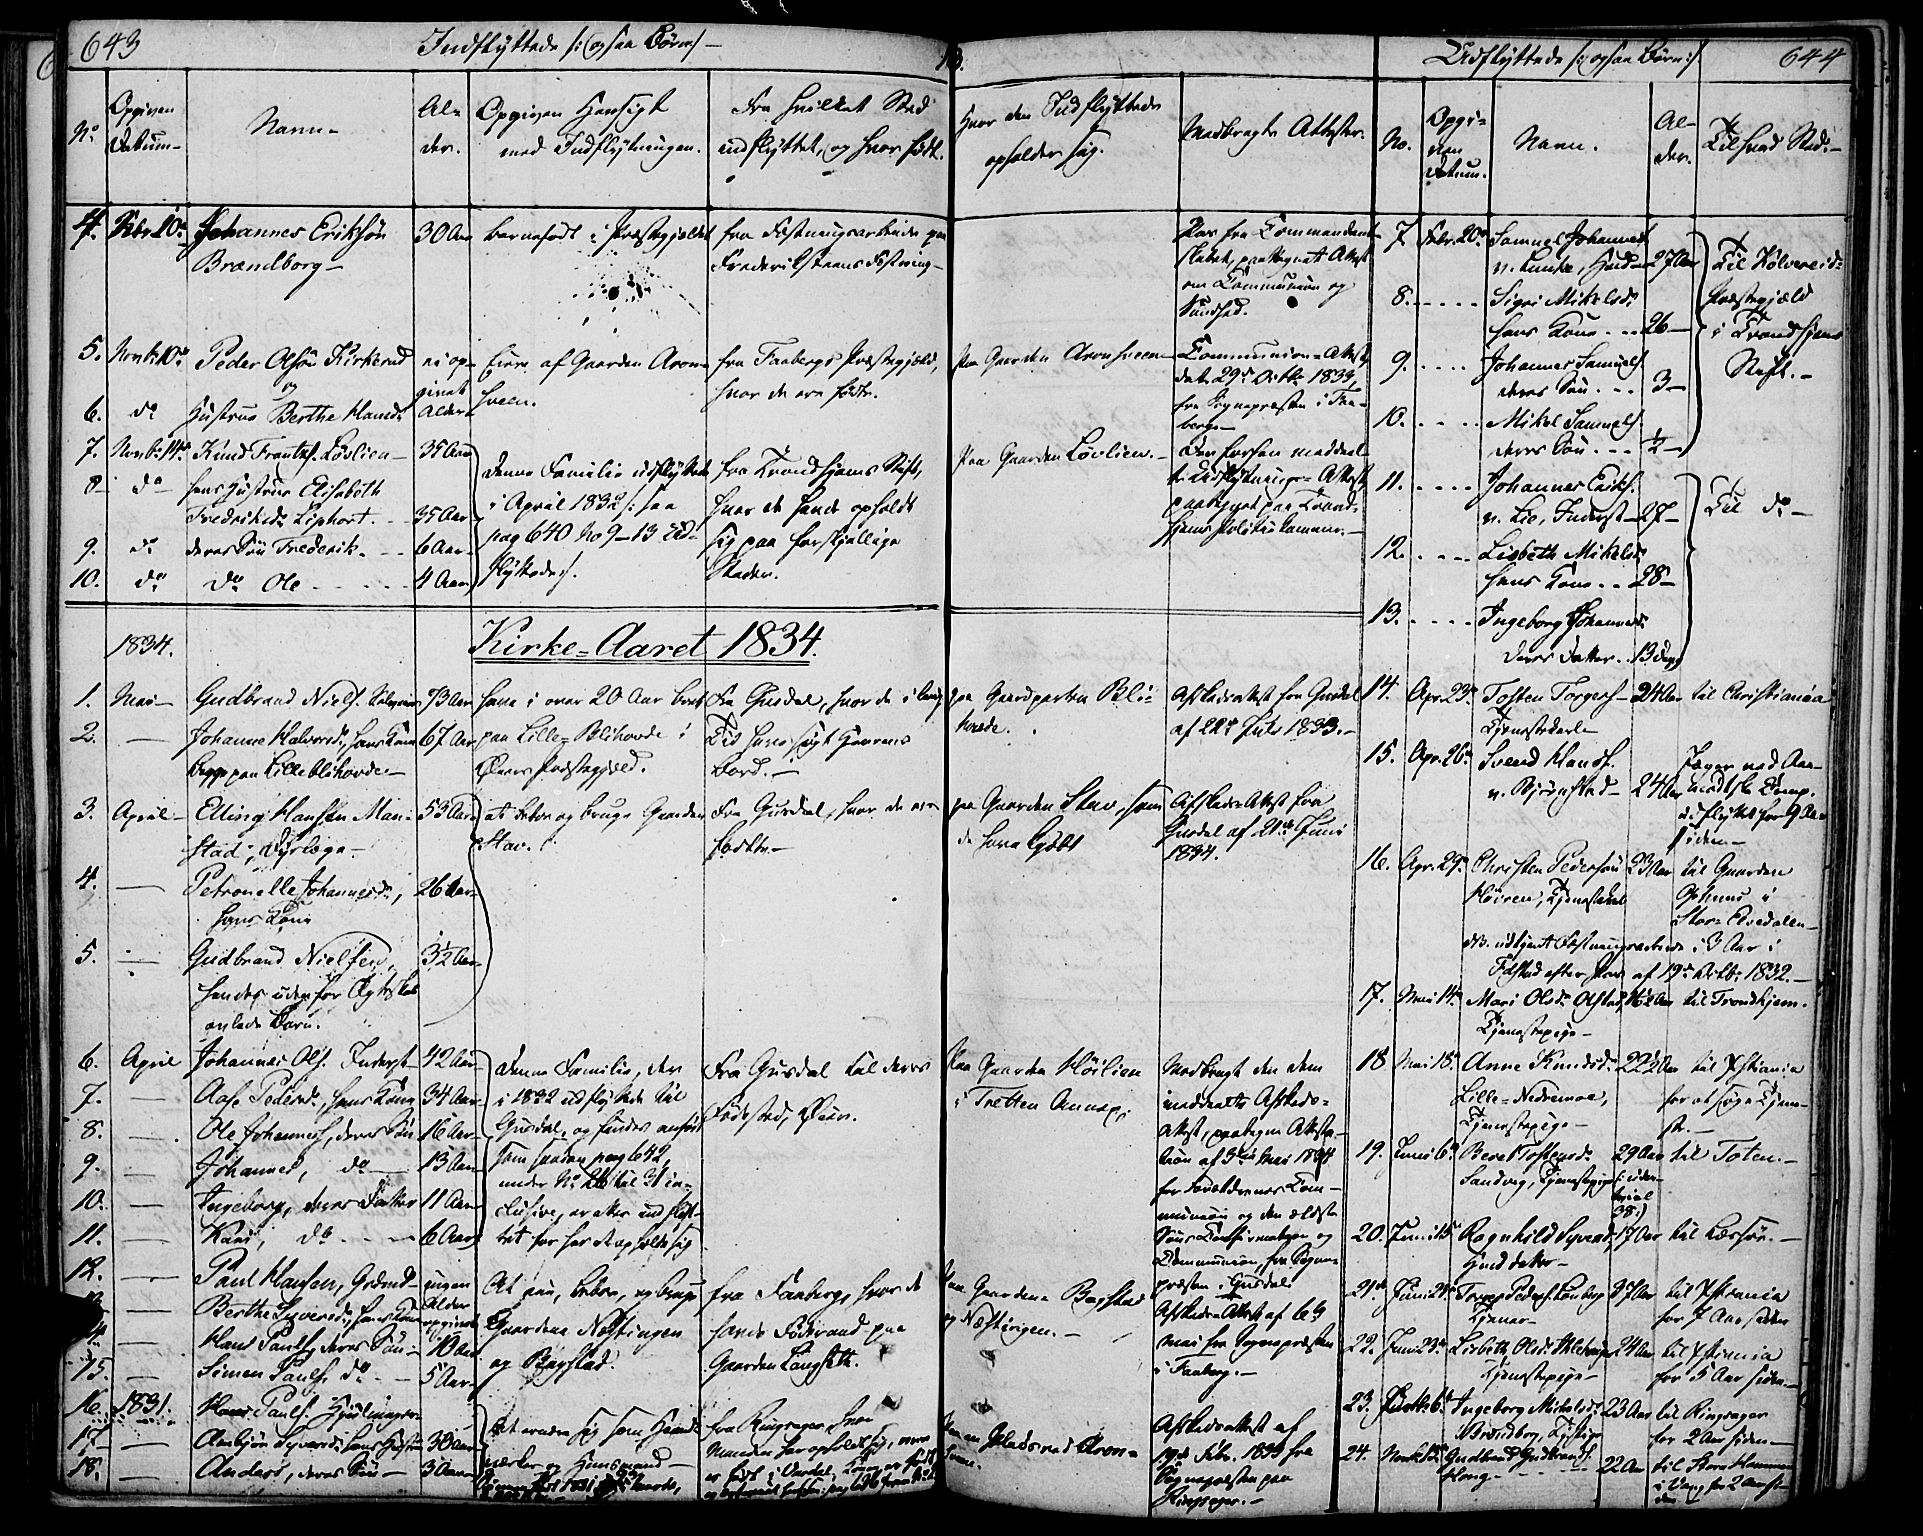 SAH, Øyer prestekontor, Ministerialbok nr. 4, 1824-1841, s. 643-644